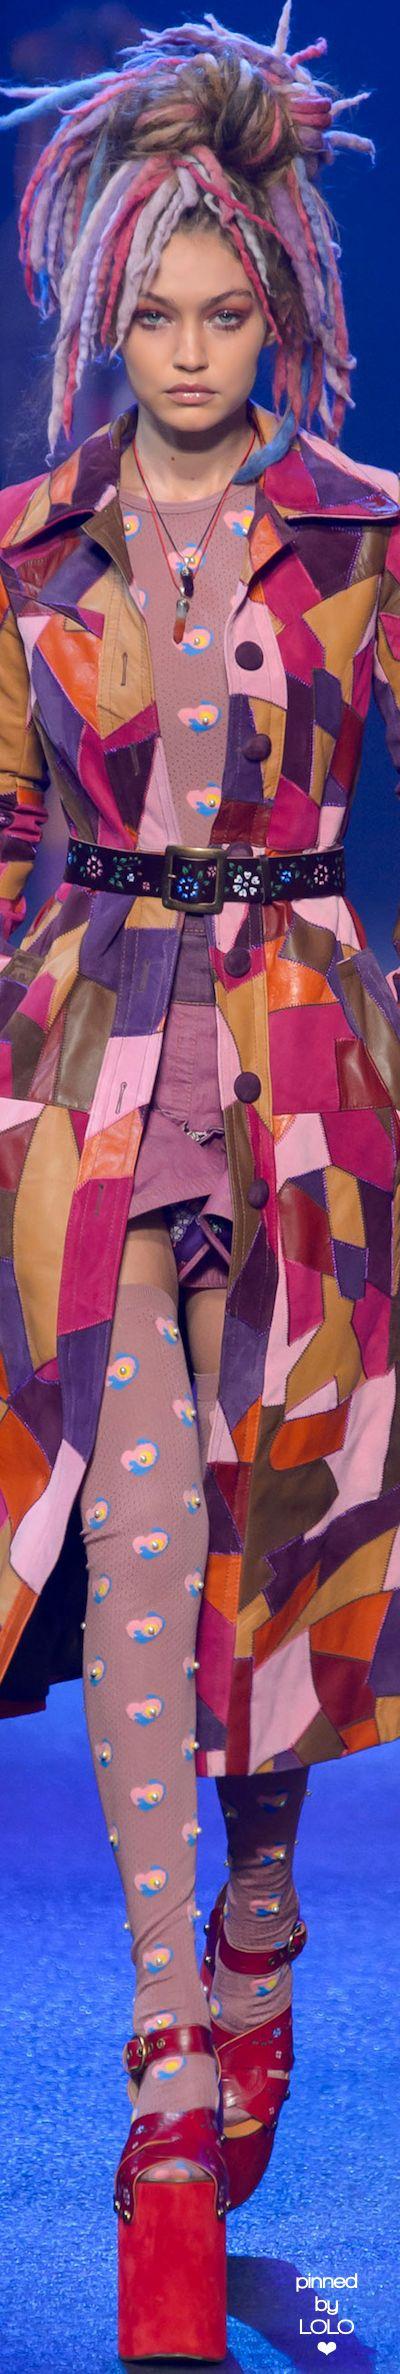 Gigi Hadid for Marc Jacobs Spring 2017 RTW | LOLO❤︎